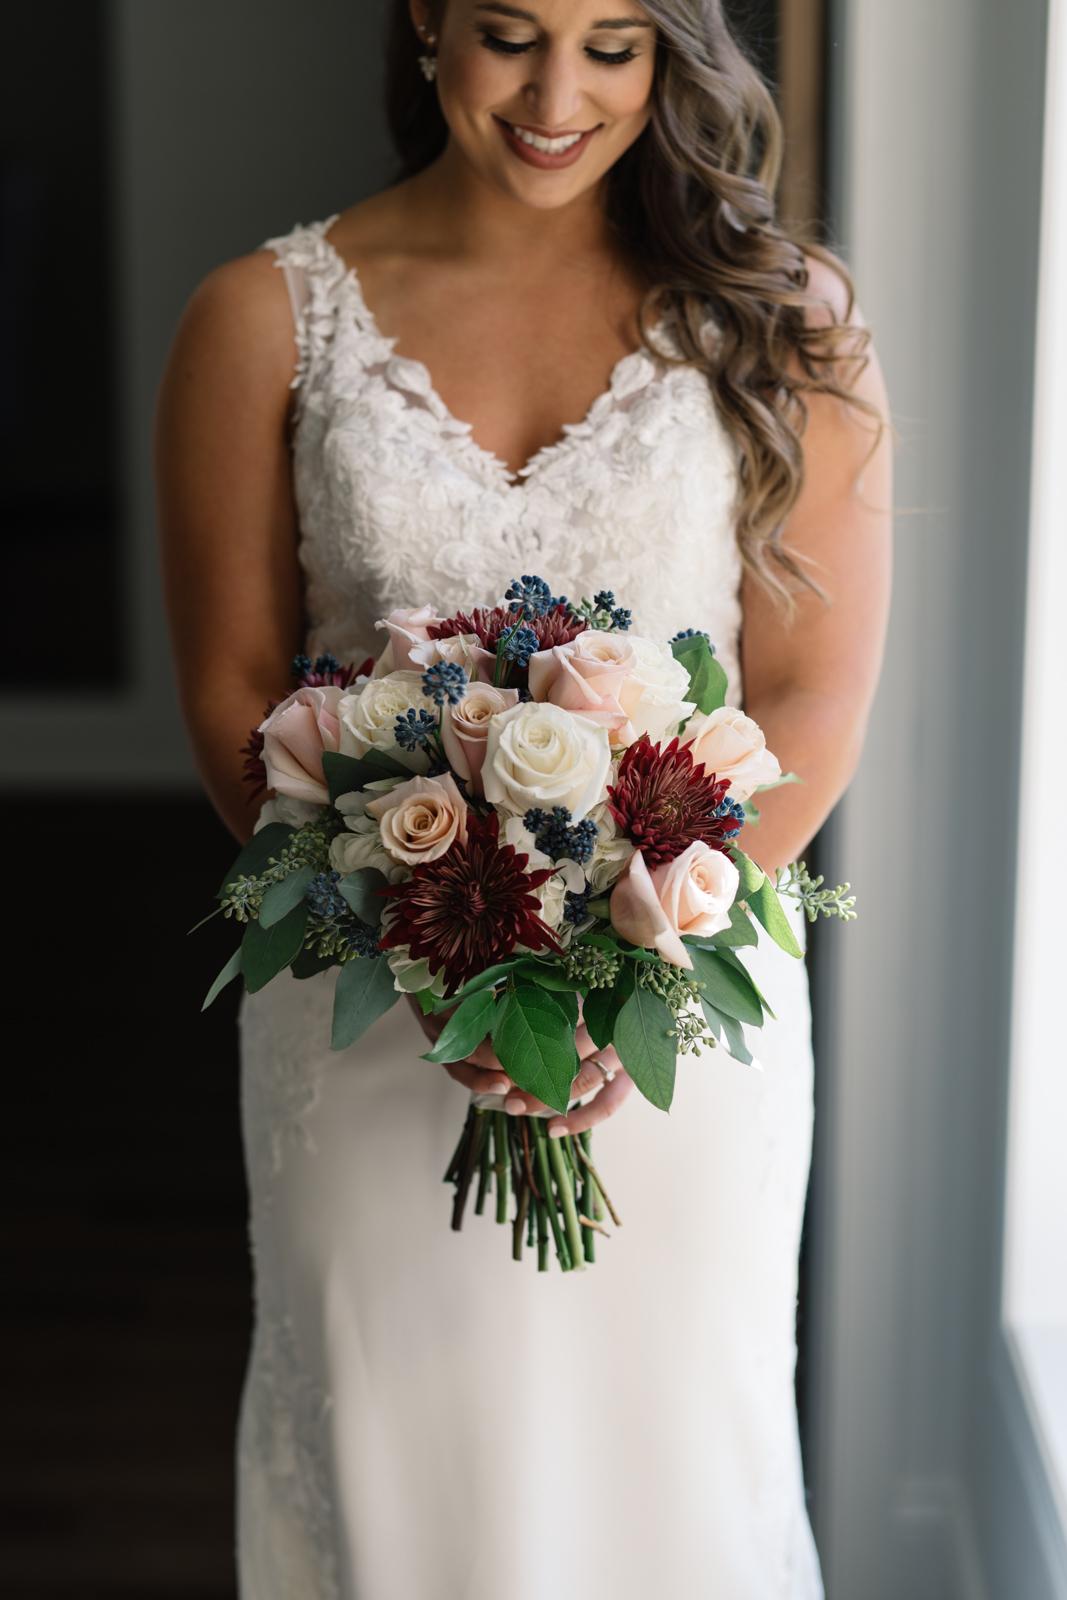 bride holding bouquet in window light bella sala bridal suite